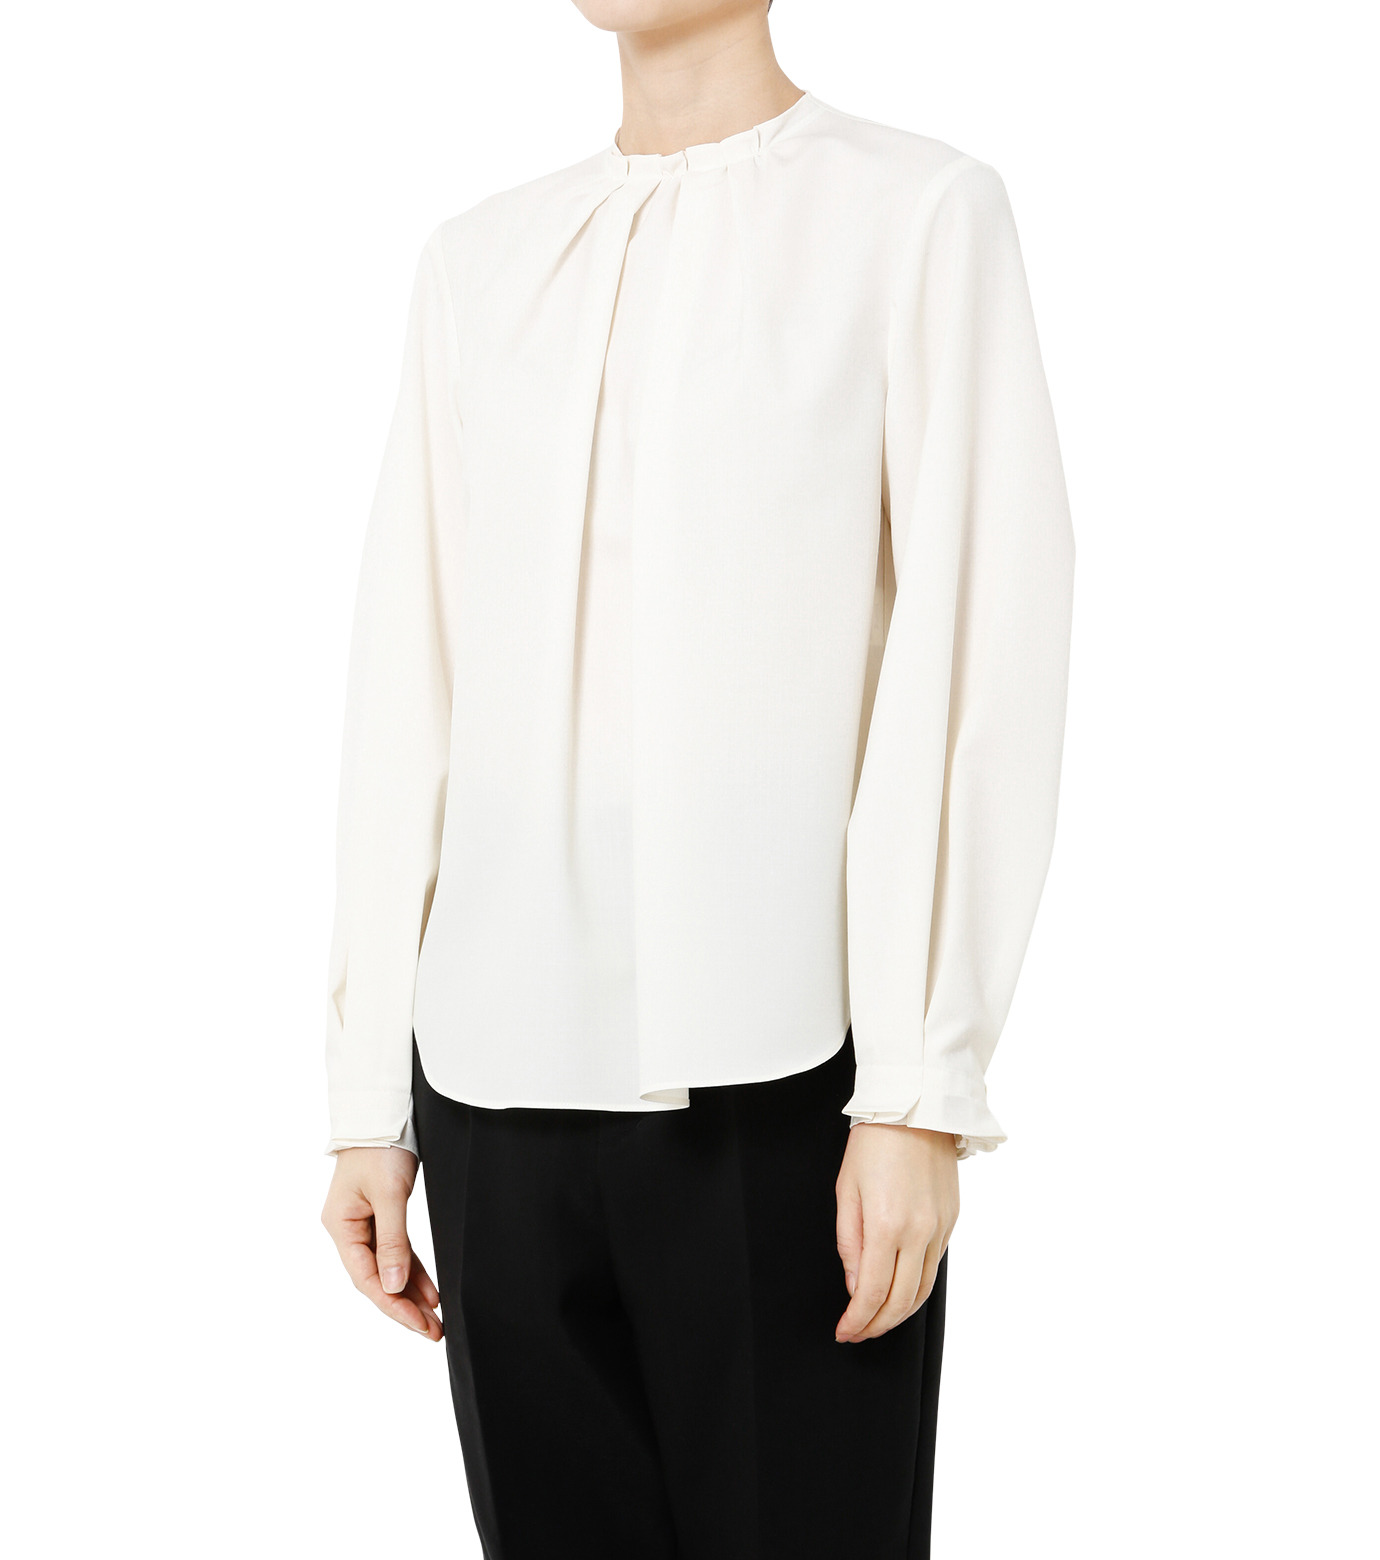 LE CIEL BLEU(ルシェルブルー)のミニマルパフスリーブトップス-WHITE(シャツ/shirt)-19S63108 拡大詳細画像3